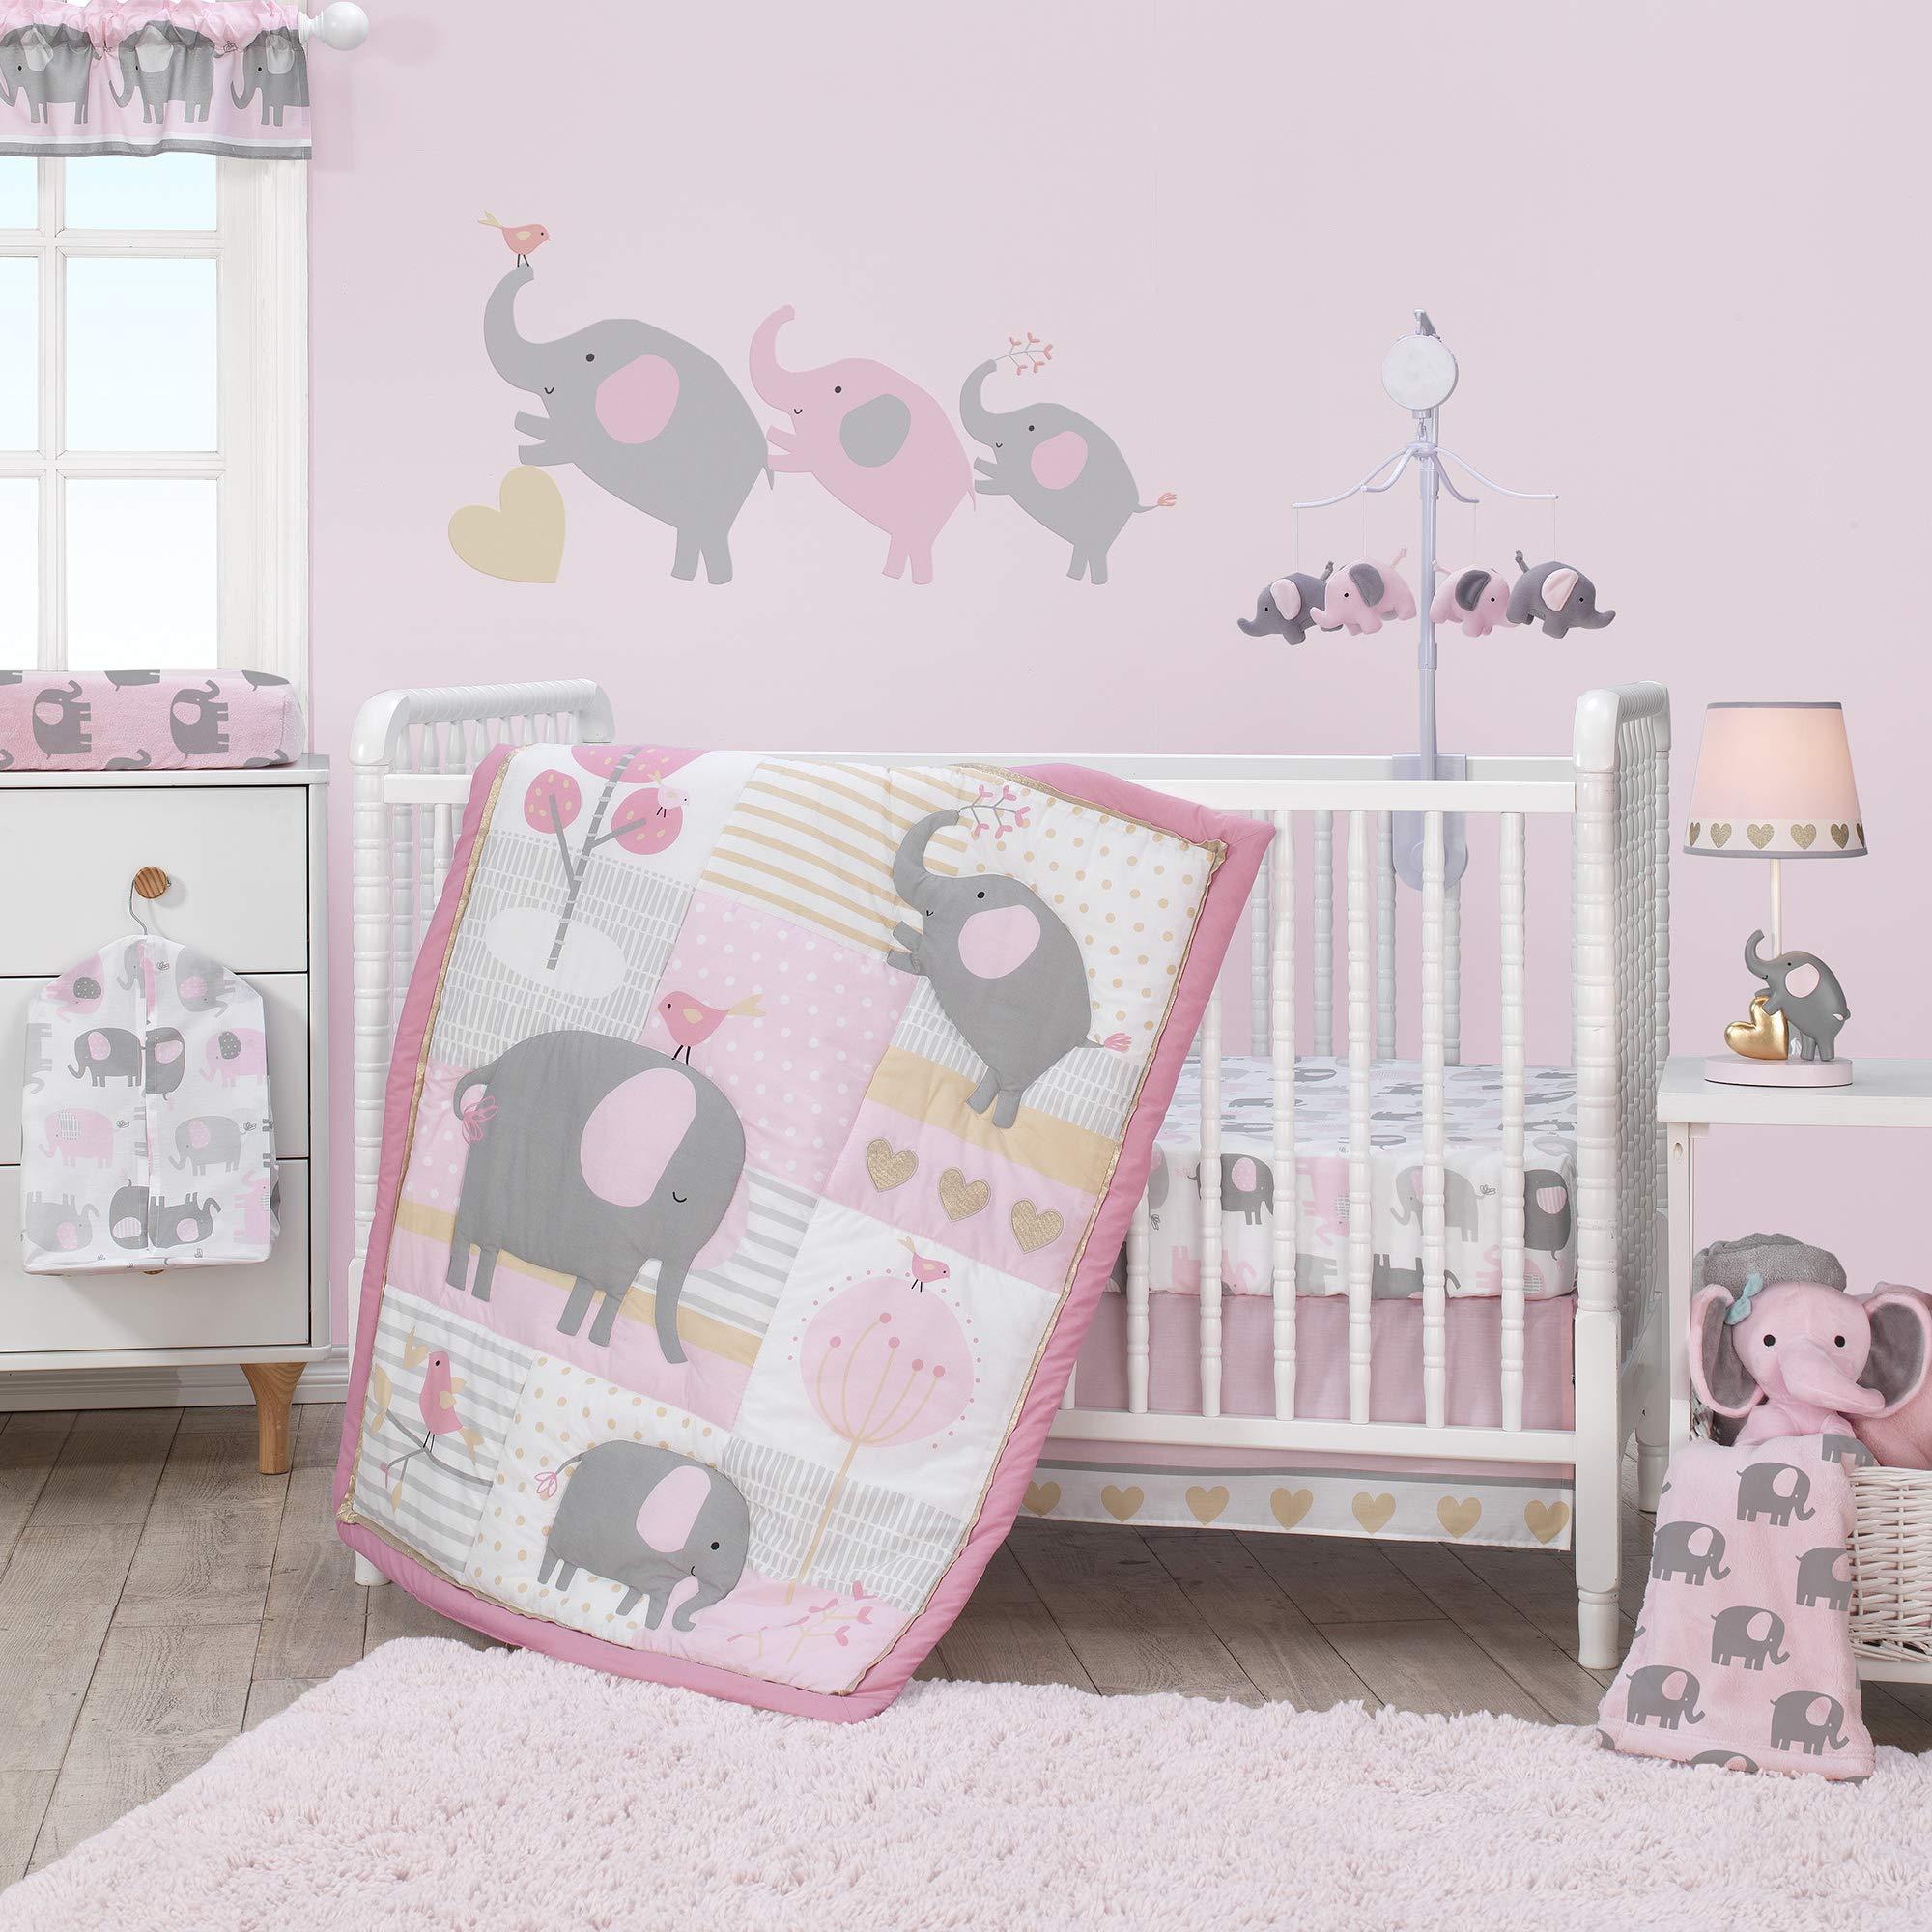 Bedtime Originals Eloise 3-Piece Crib Bedding Set, Pink by Bedtime Originals